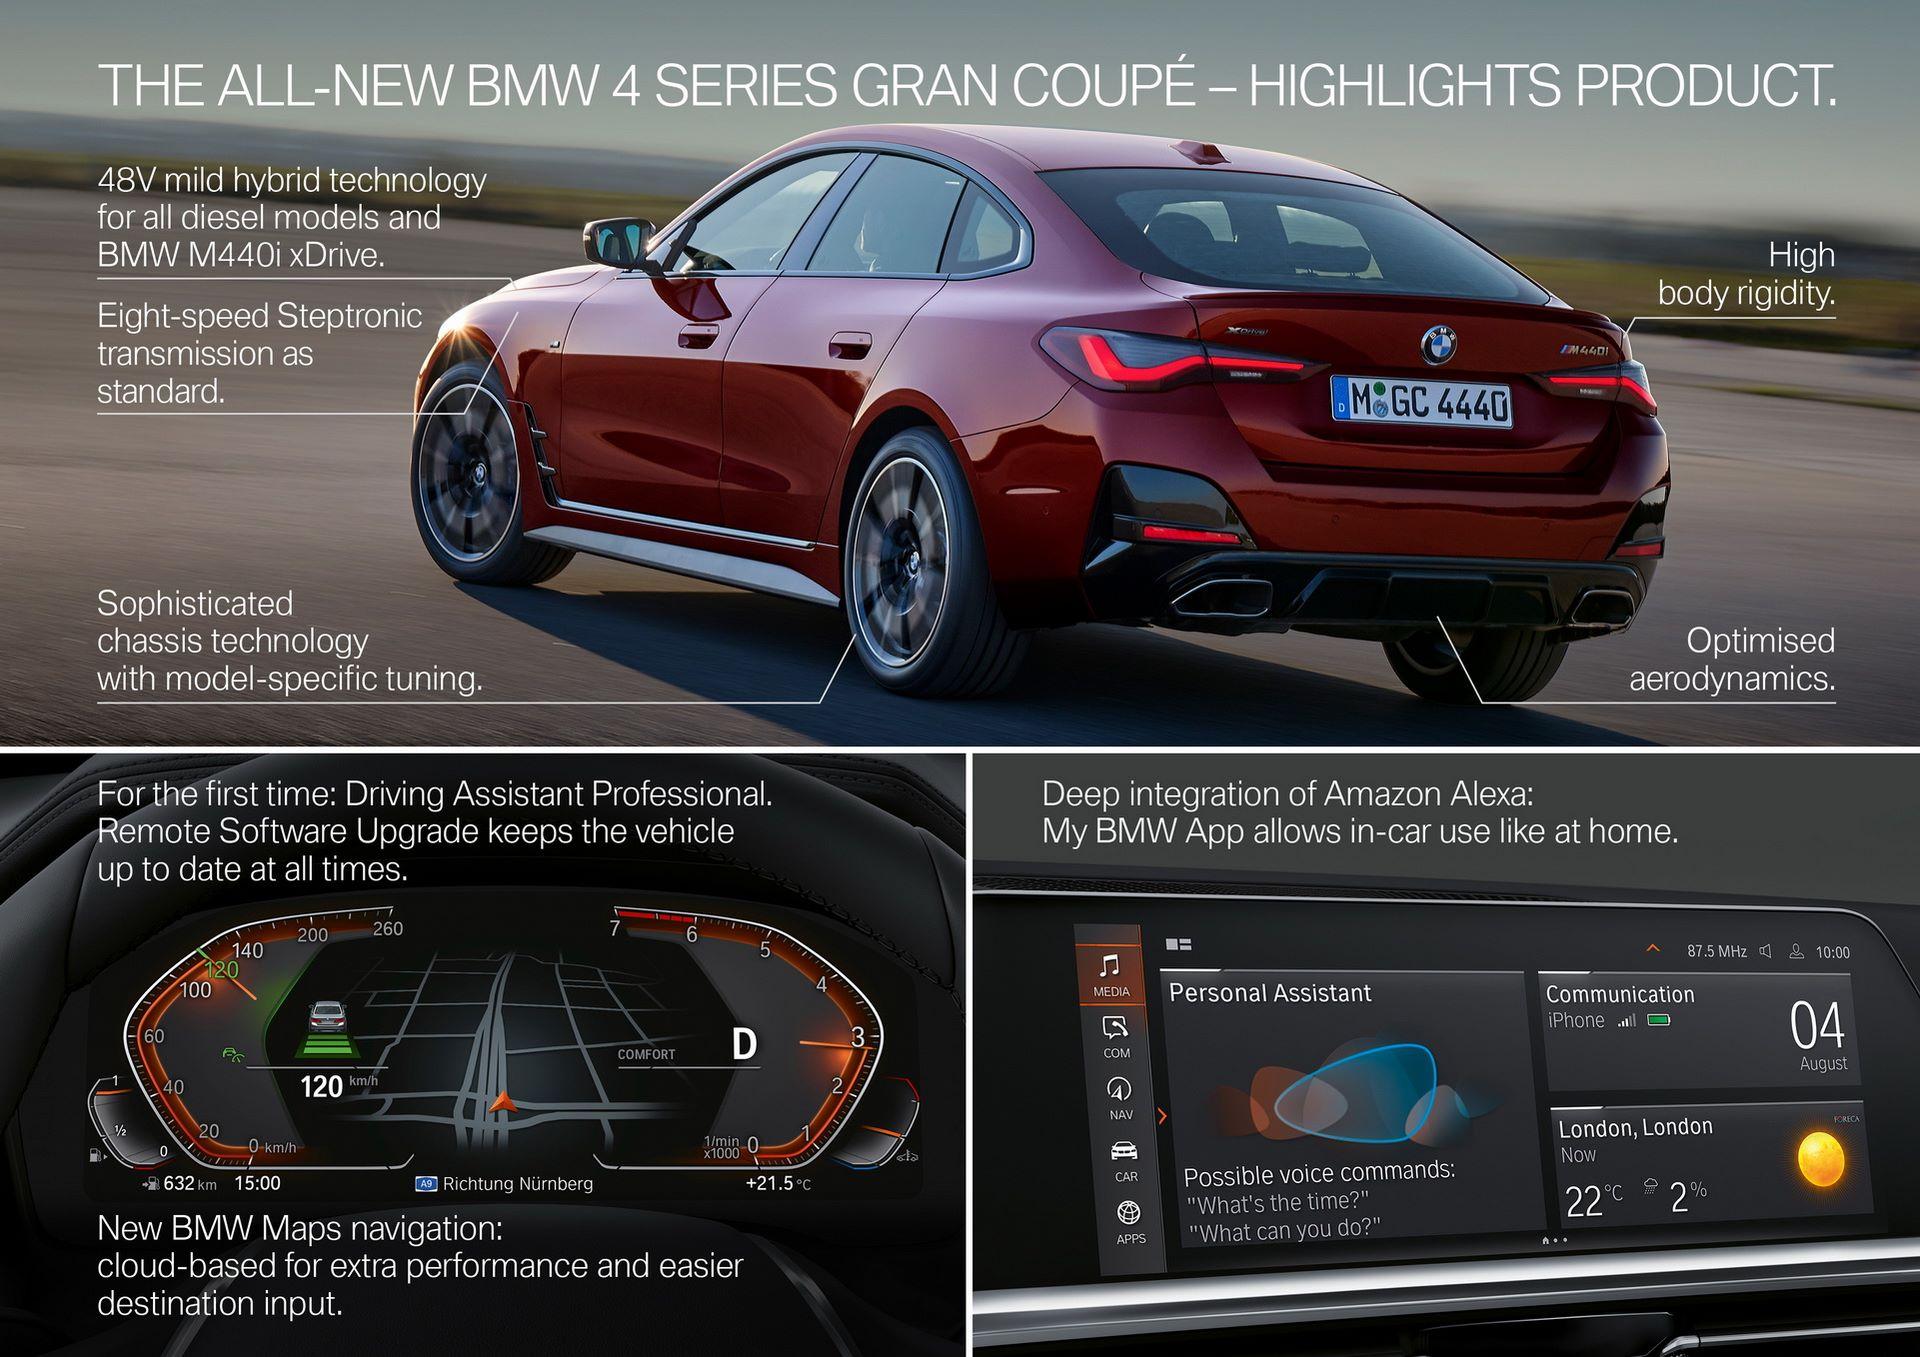 BMW-4-Series-Gran-Coupe-68